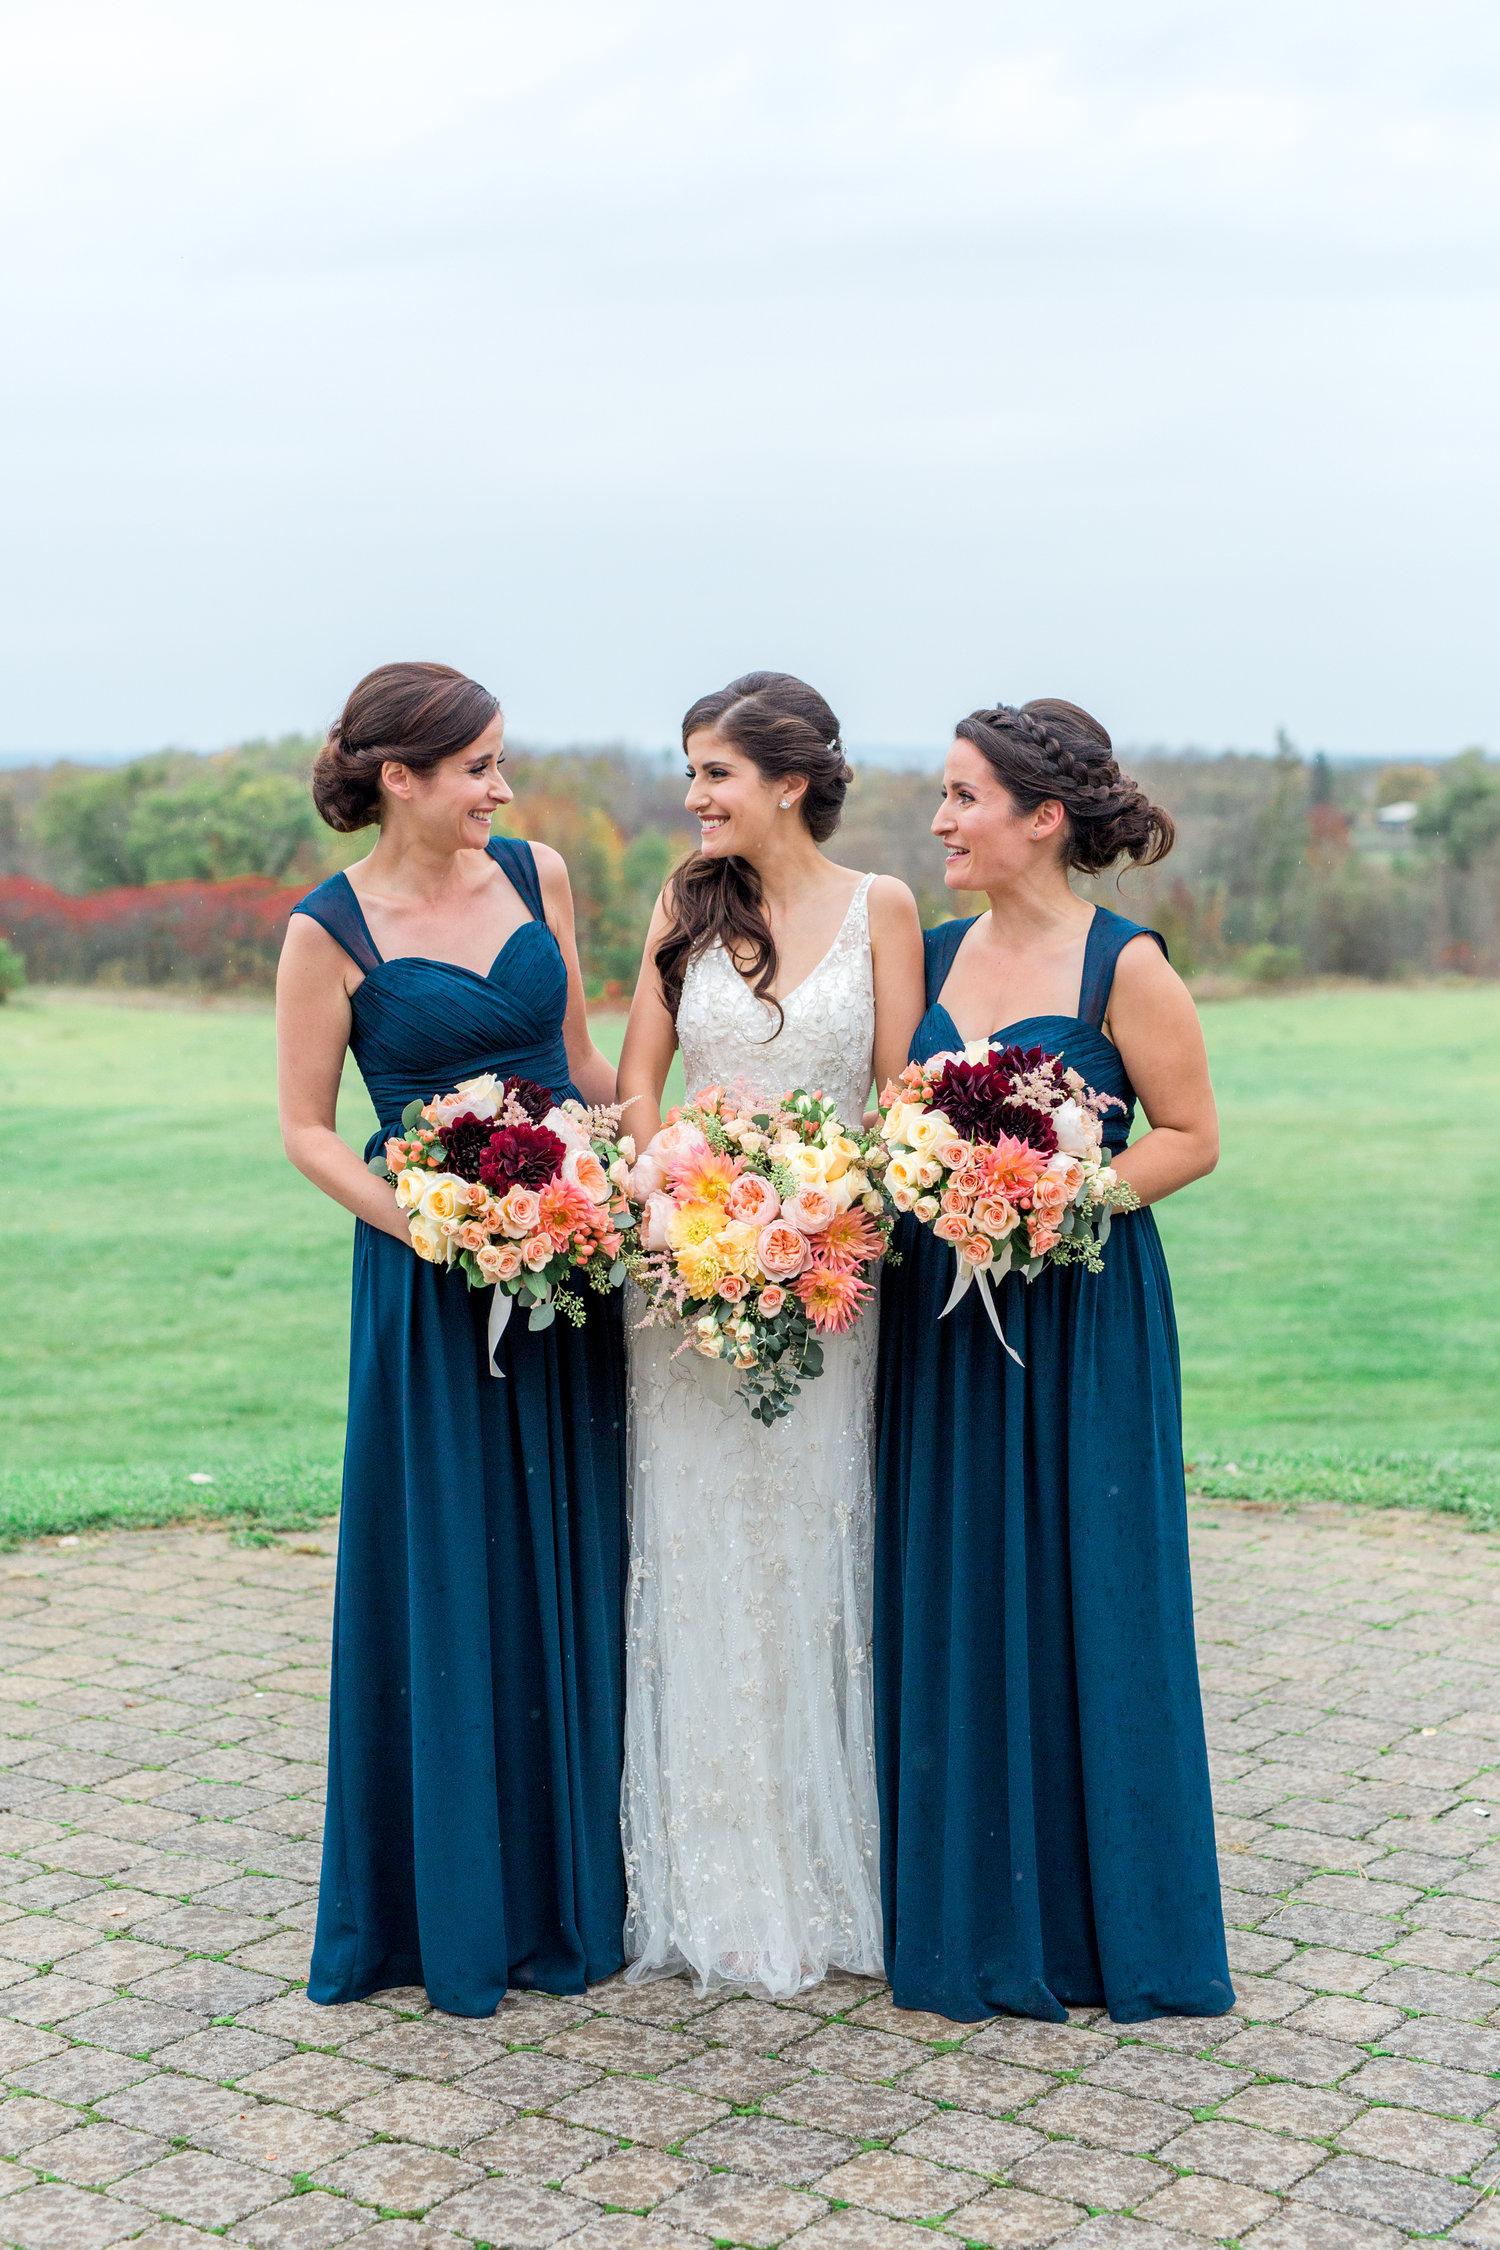 Amir-Golbazi-Danielle-Giroux-Photography_Toronto-Wedding_Cedarwood_Rachel-Paul_407.jpg